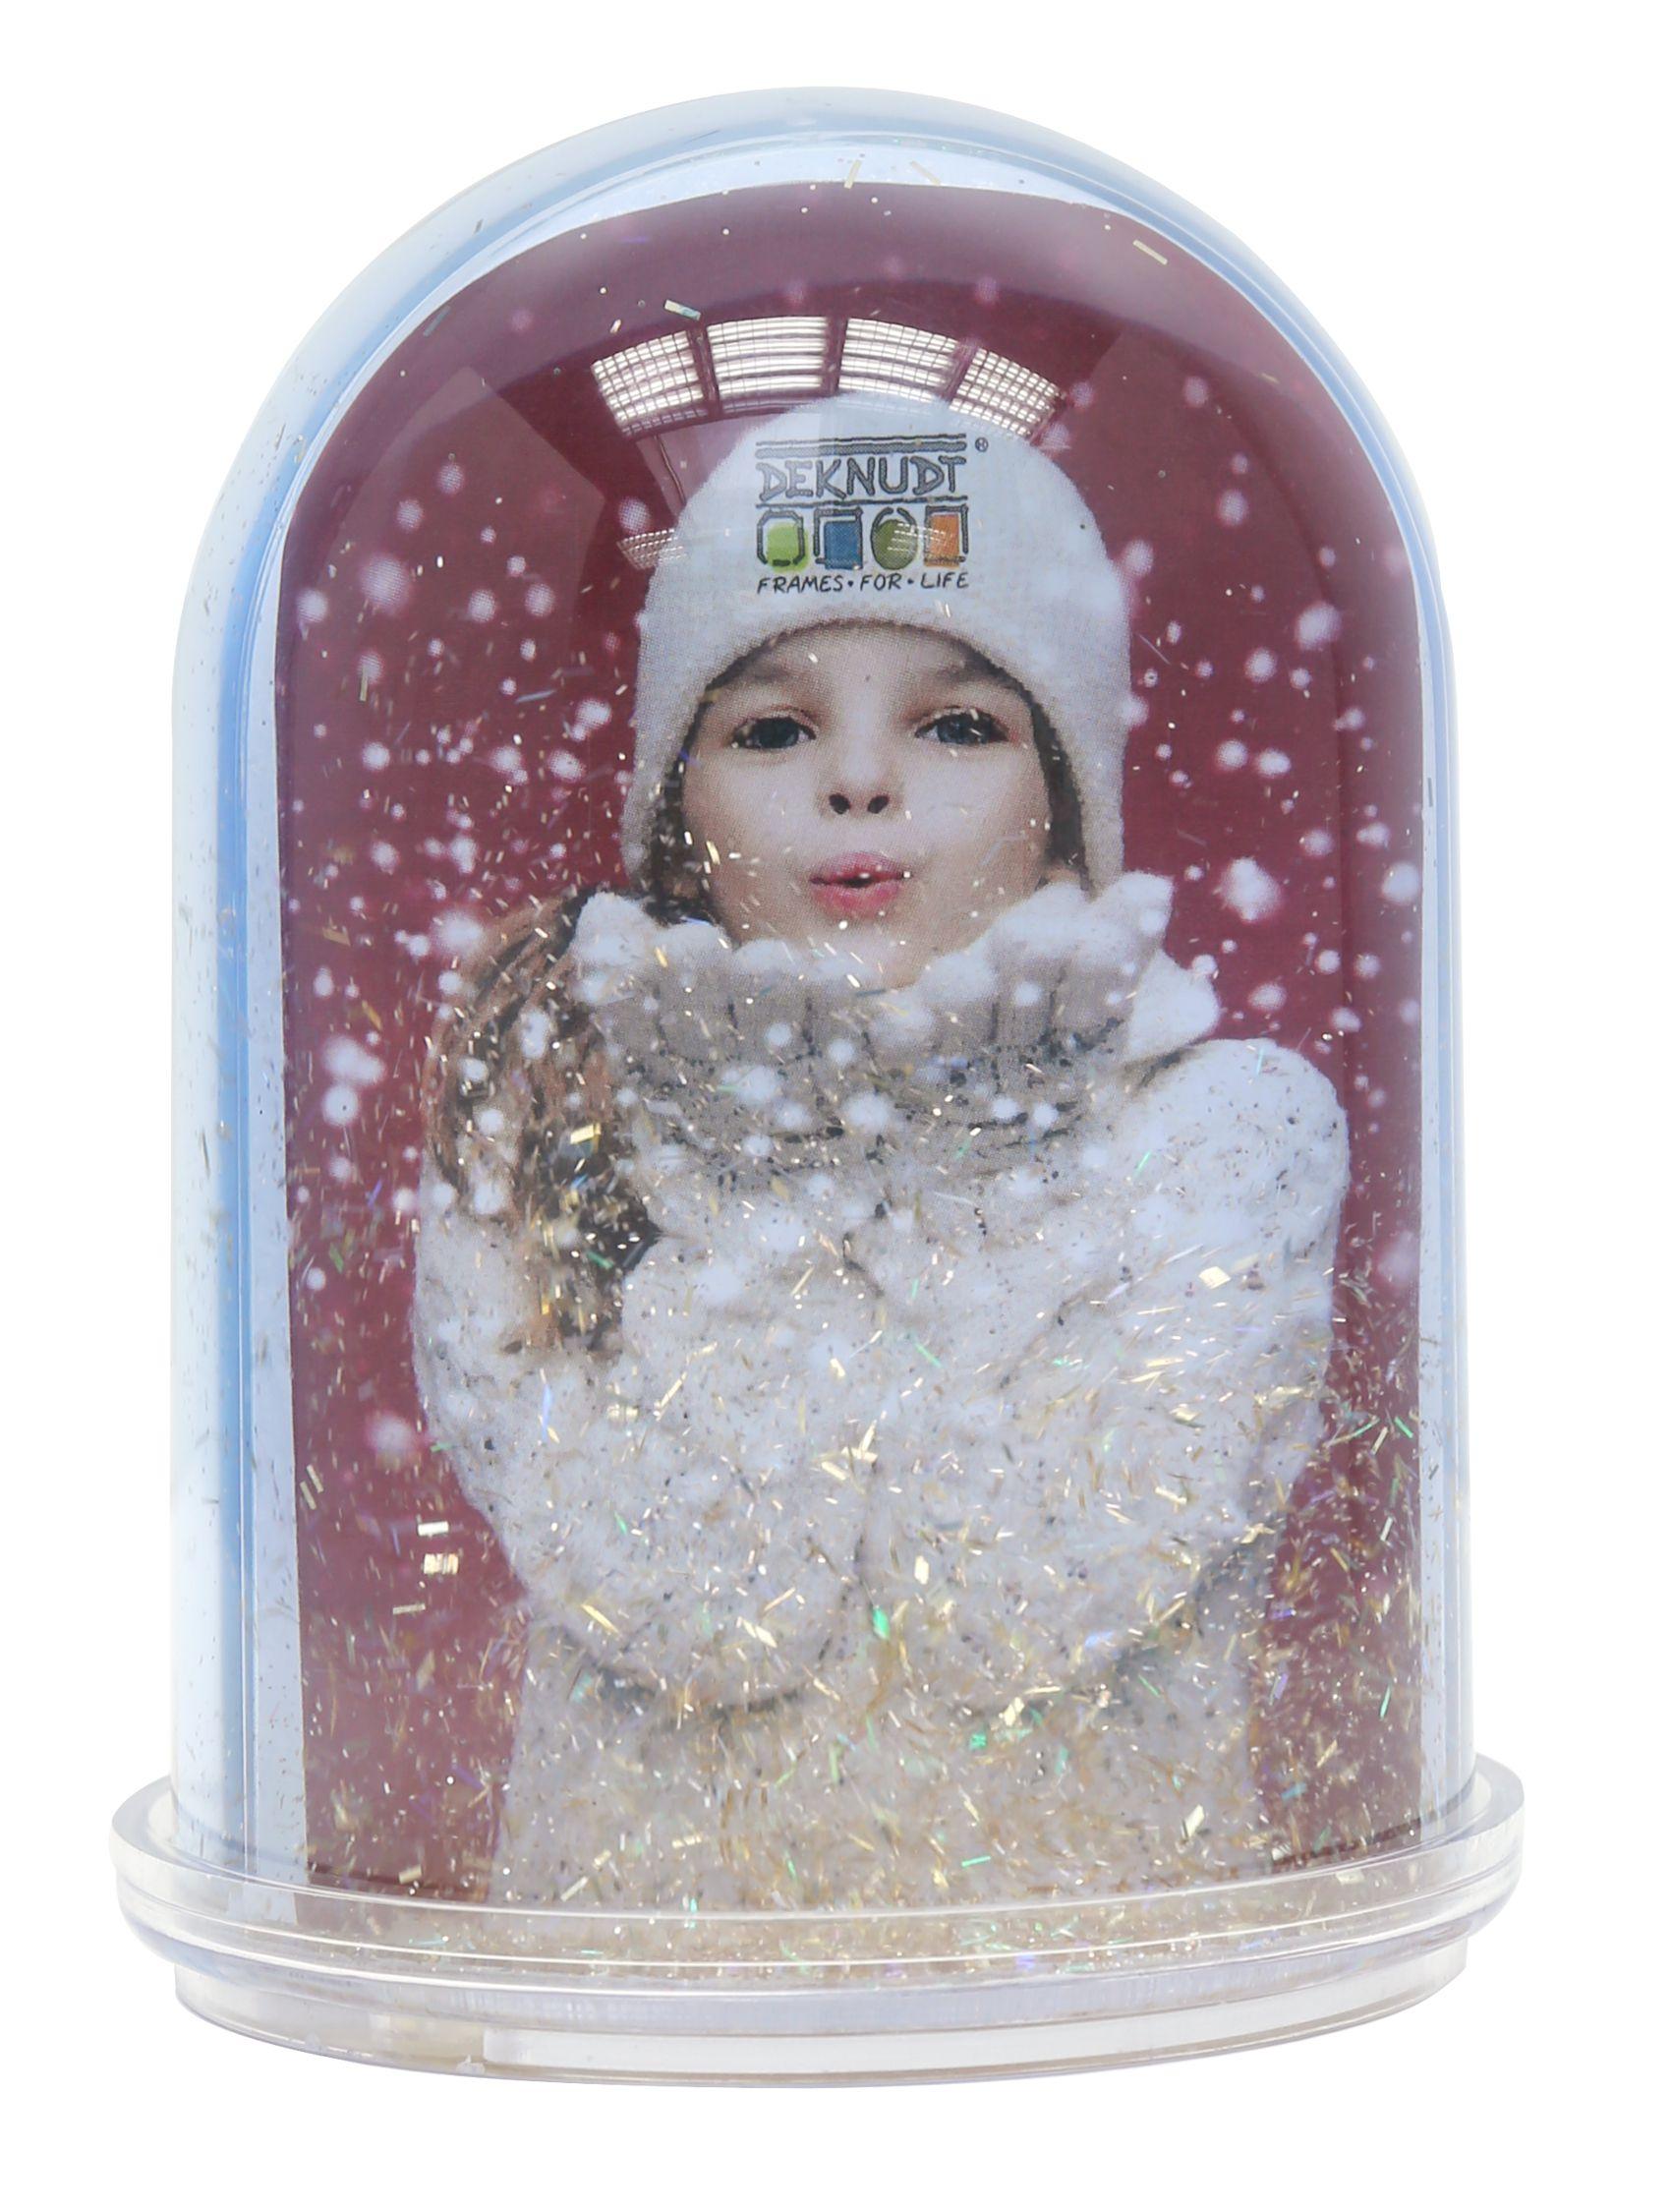 kerst, fotosneeuwbal transparant kunststof S66FA7